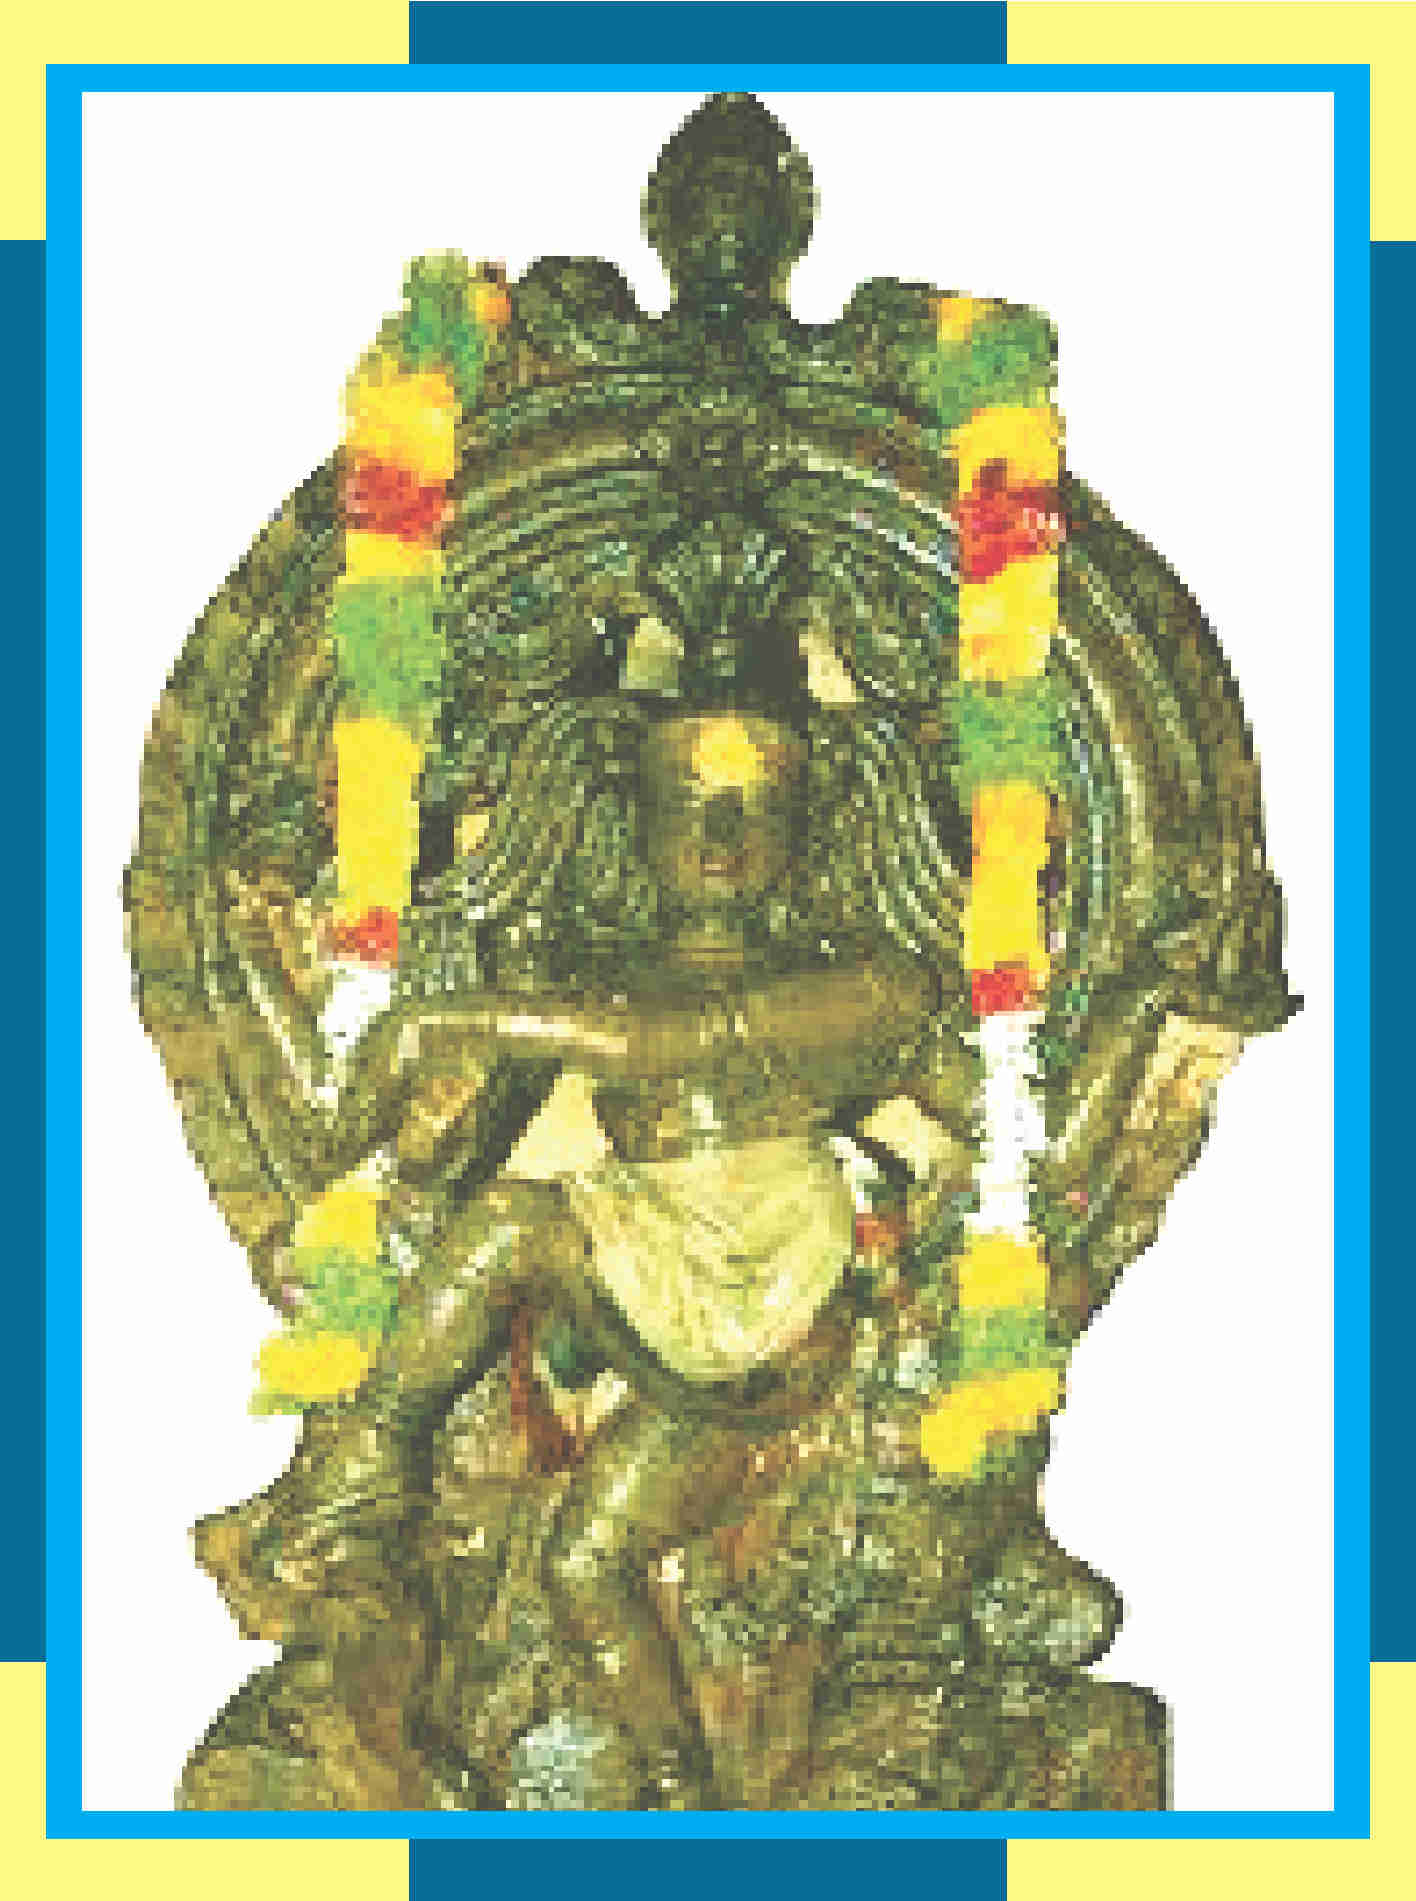 Uthirakosamangai - Mangalanathar Temple Dasa Maha Vidya Abishekam